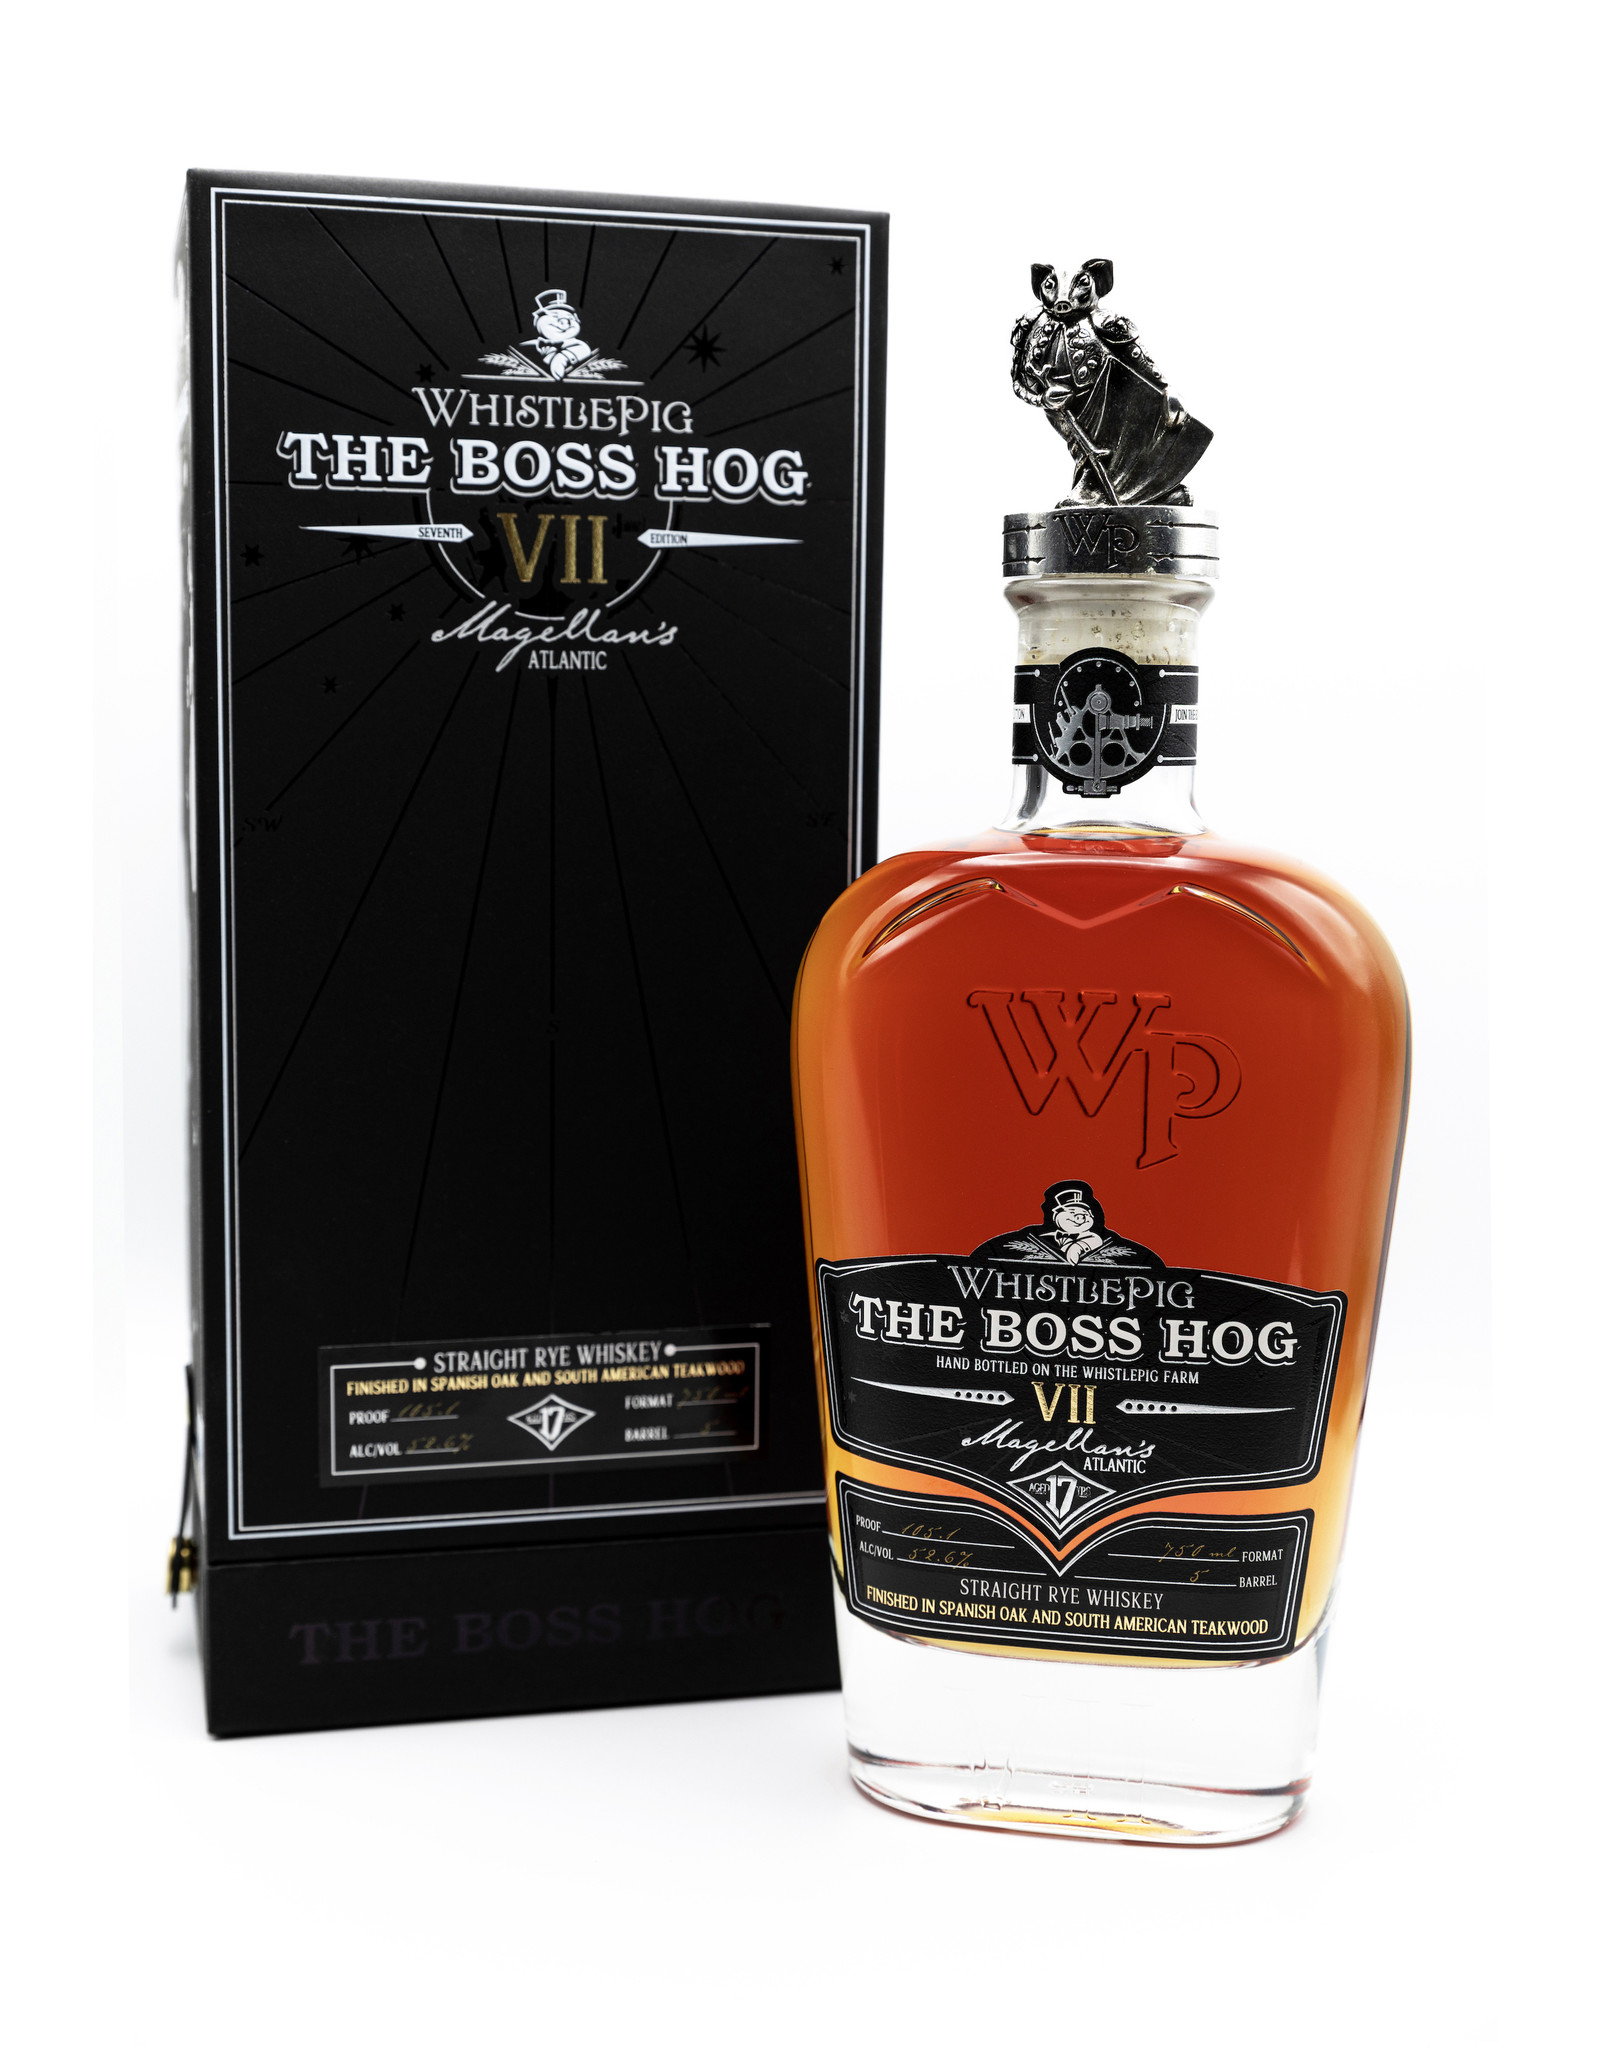 Whistle Pig Boss Hog VII Magellan's Atlantic